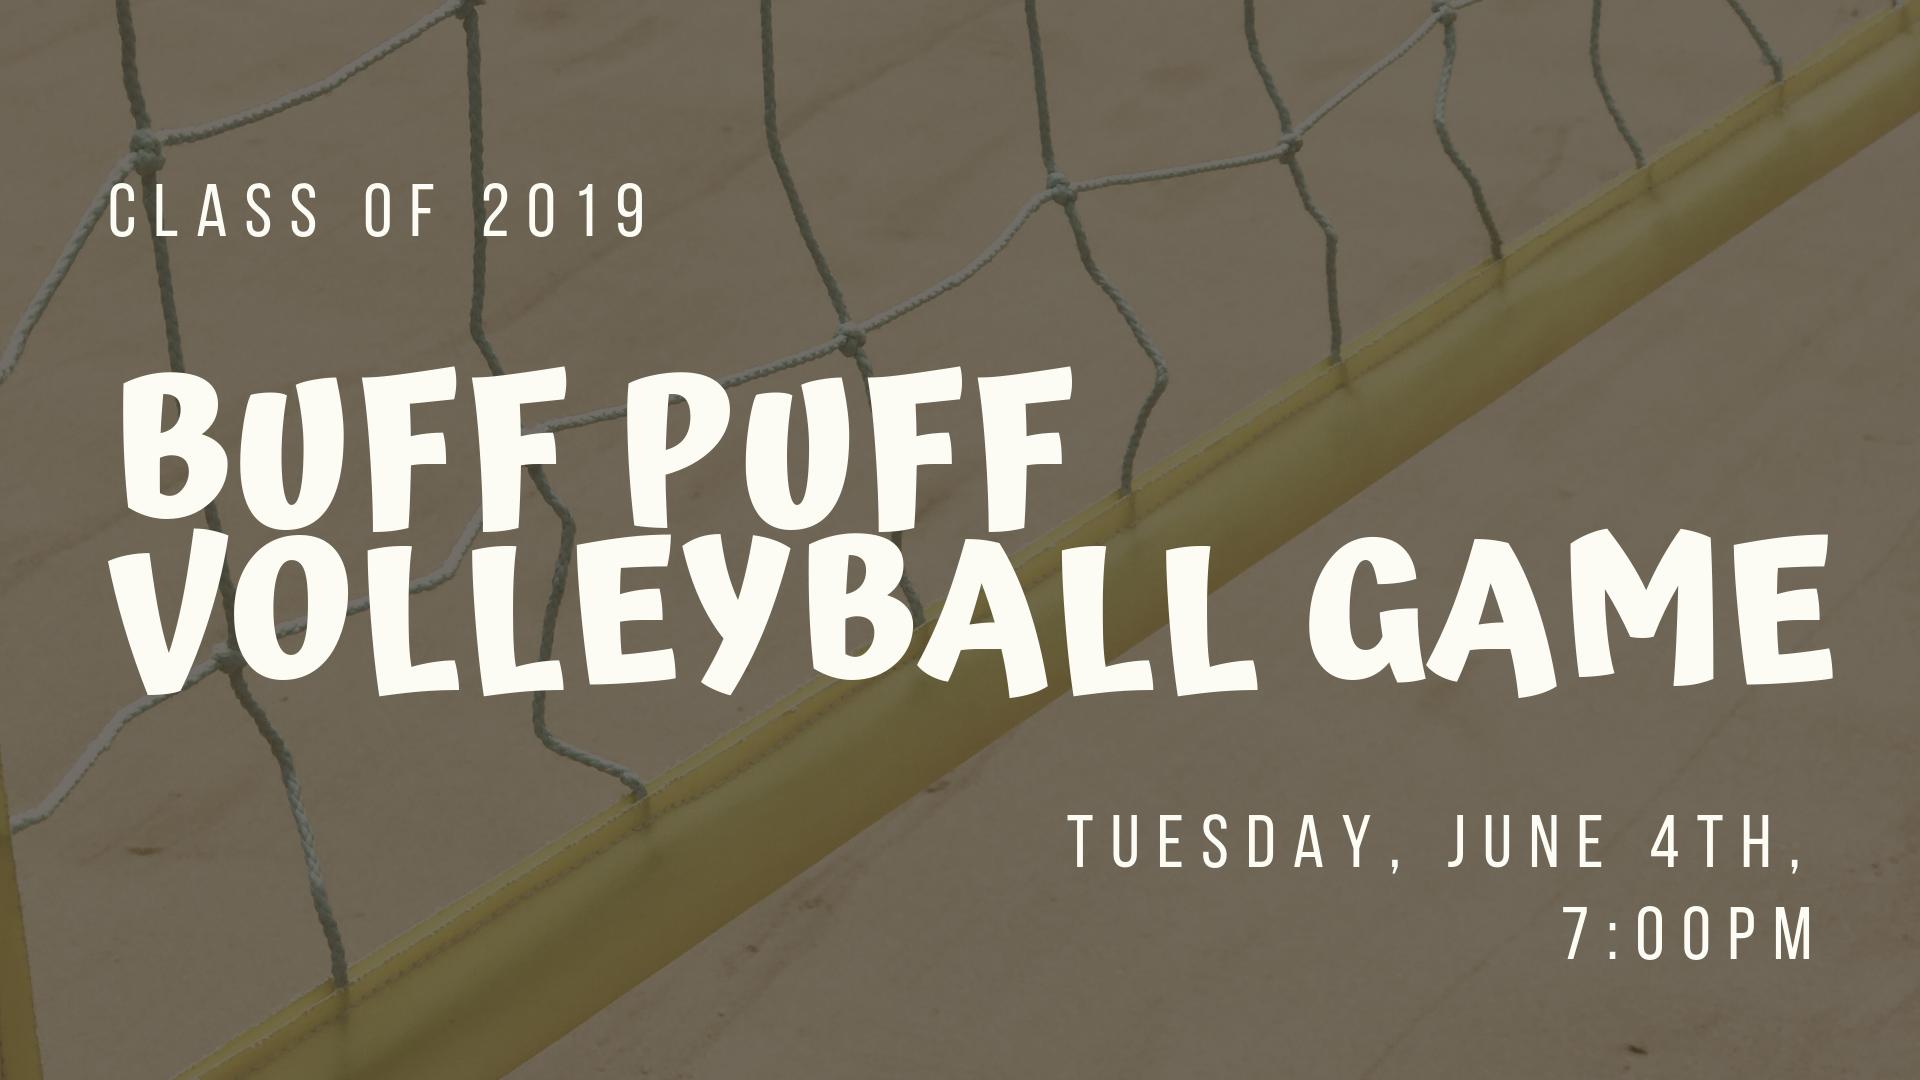 buff puff volleyball